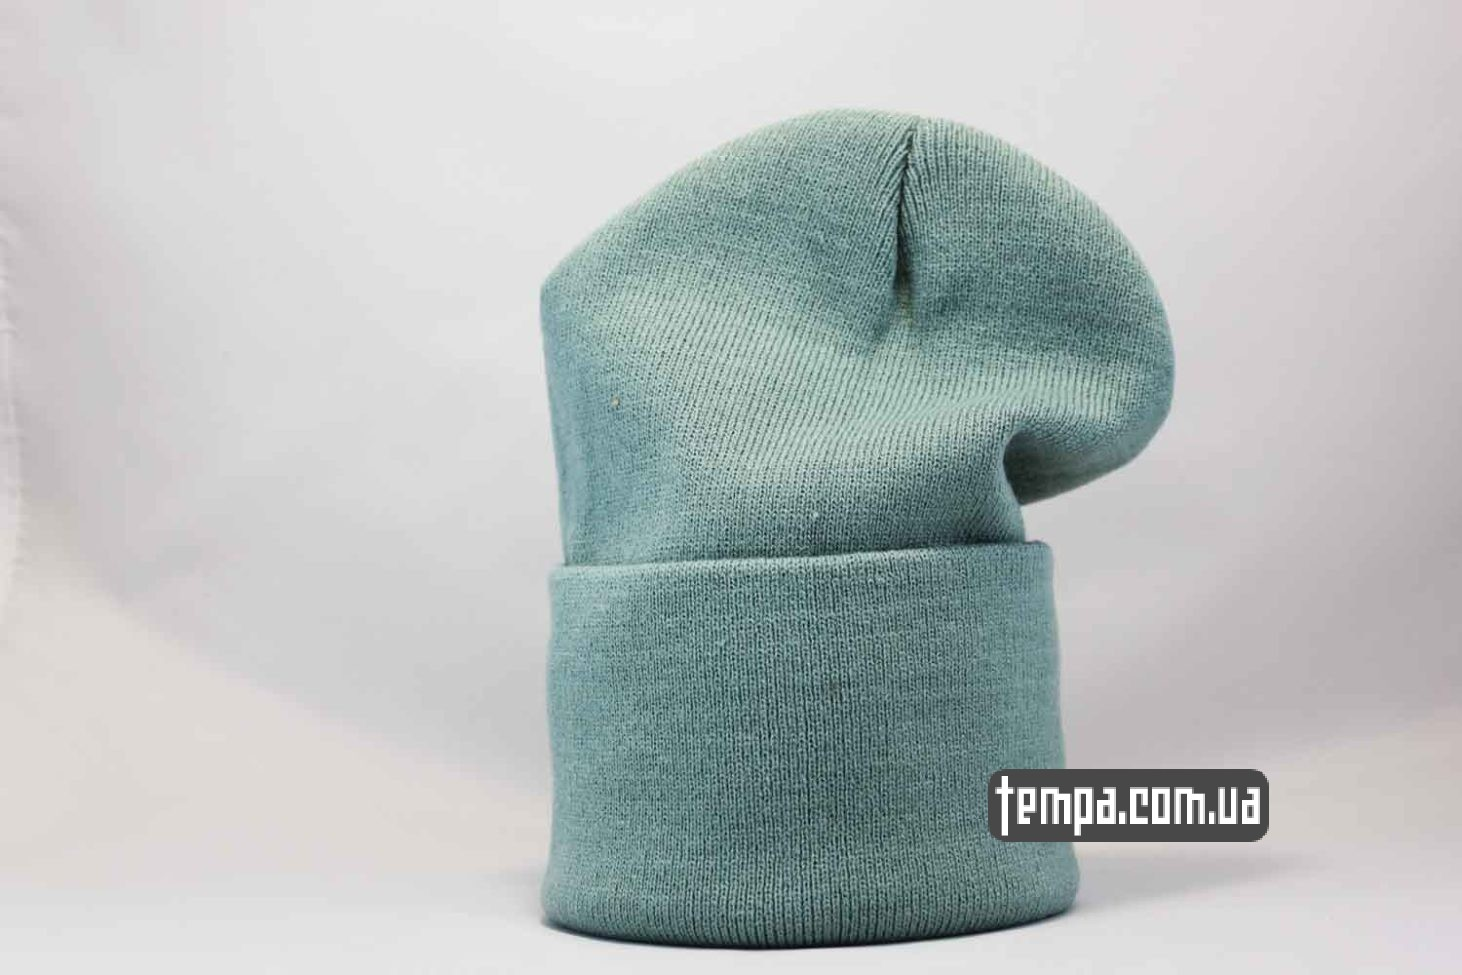 кархарт Украина шапка beanie Carhartt зеленая оригинал купить